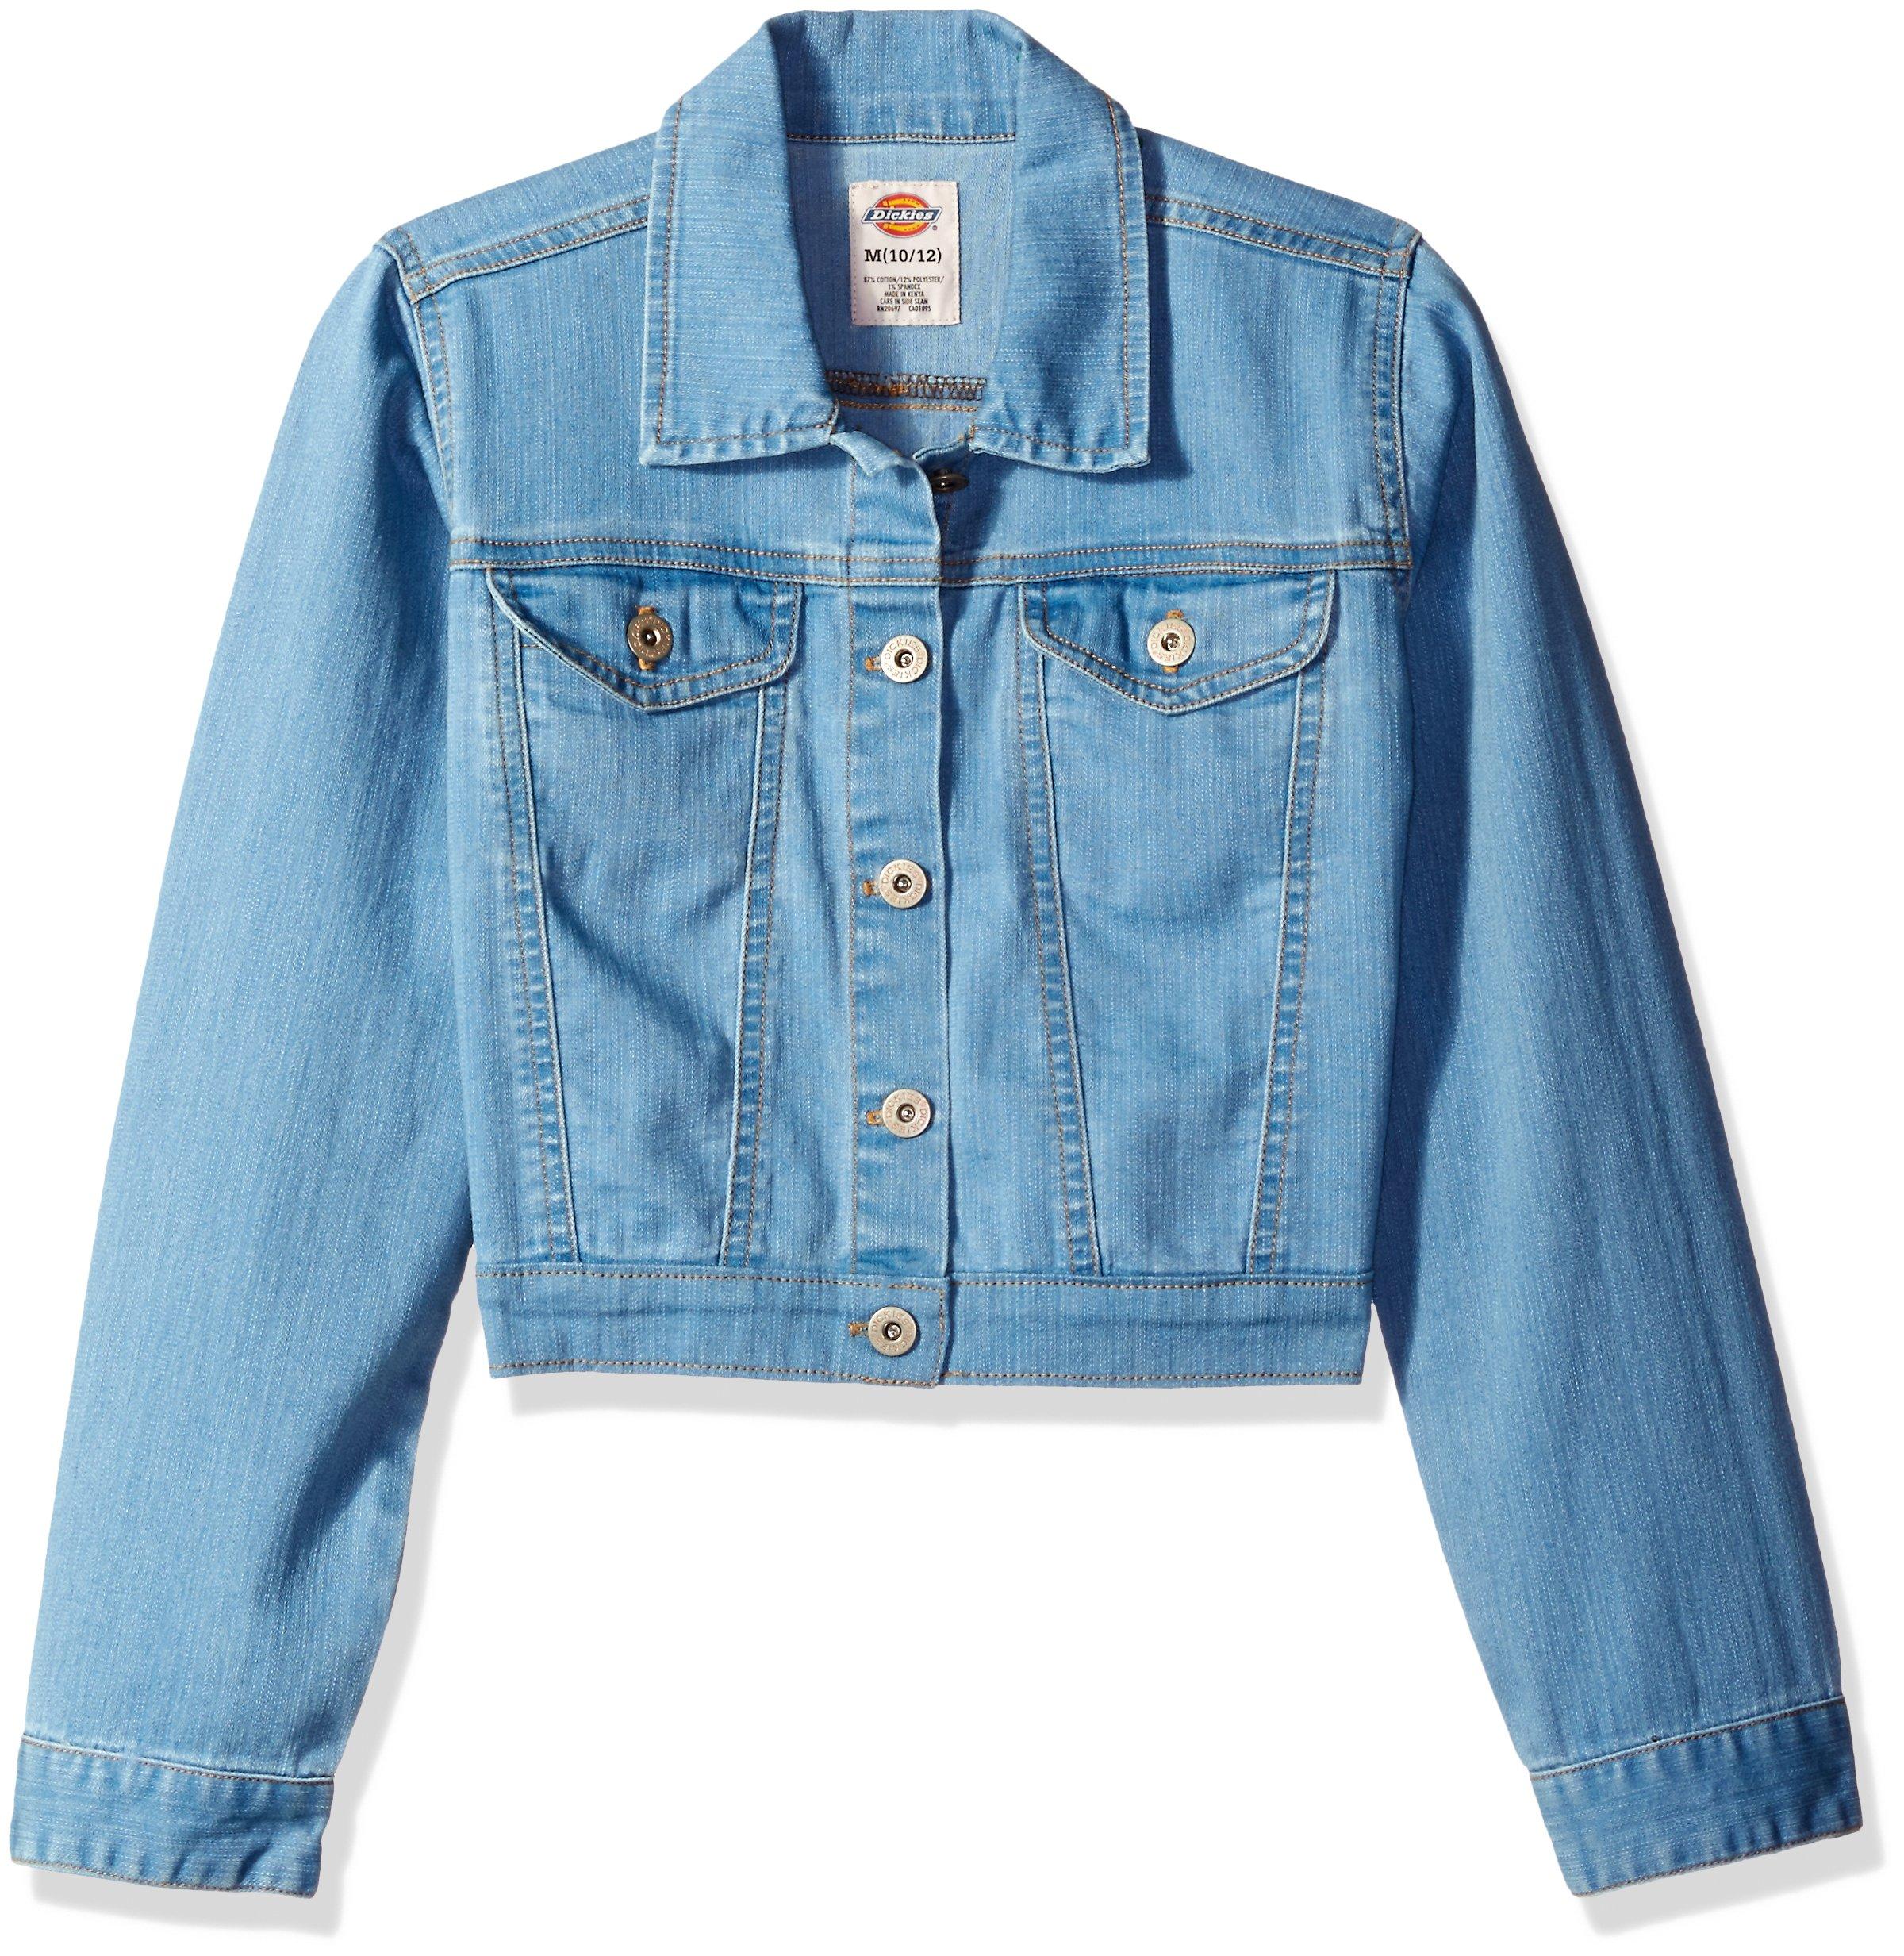 Dickies Girls' Big Girls' Denim Jacket, Bleach Stonewash with Tint, M